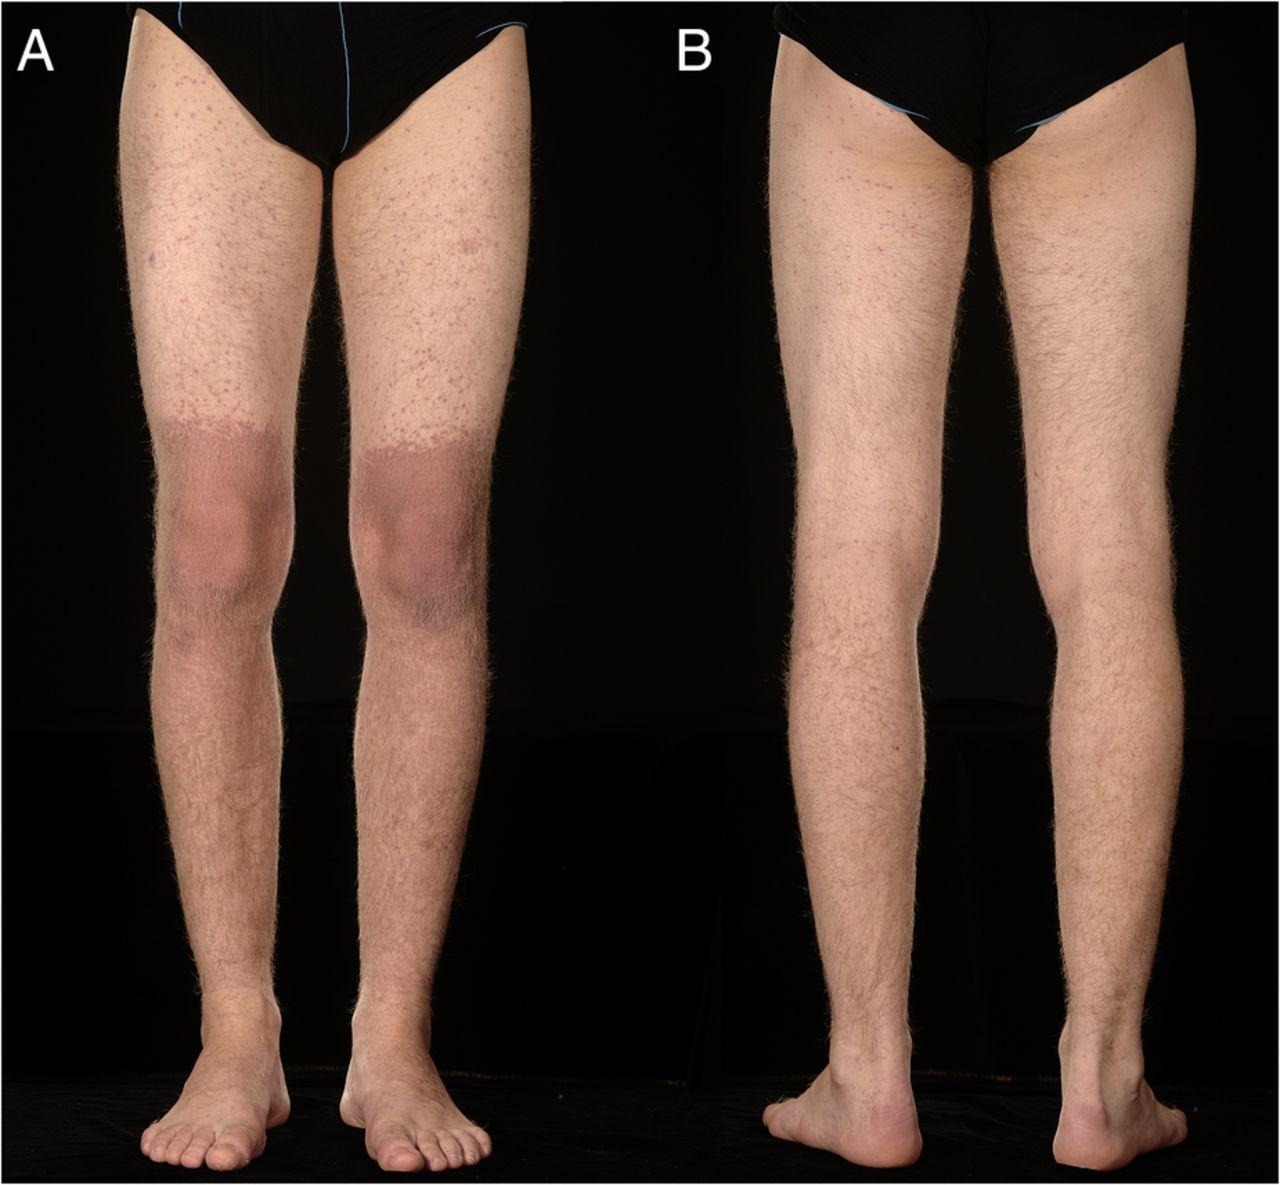 Amoxicillin-associated rash in glandular fever | BMJ Case